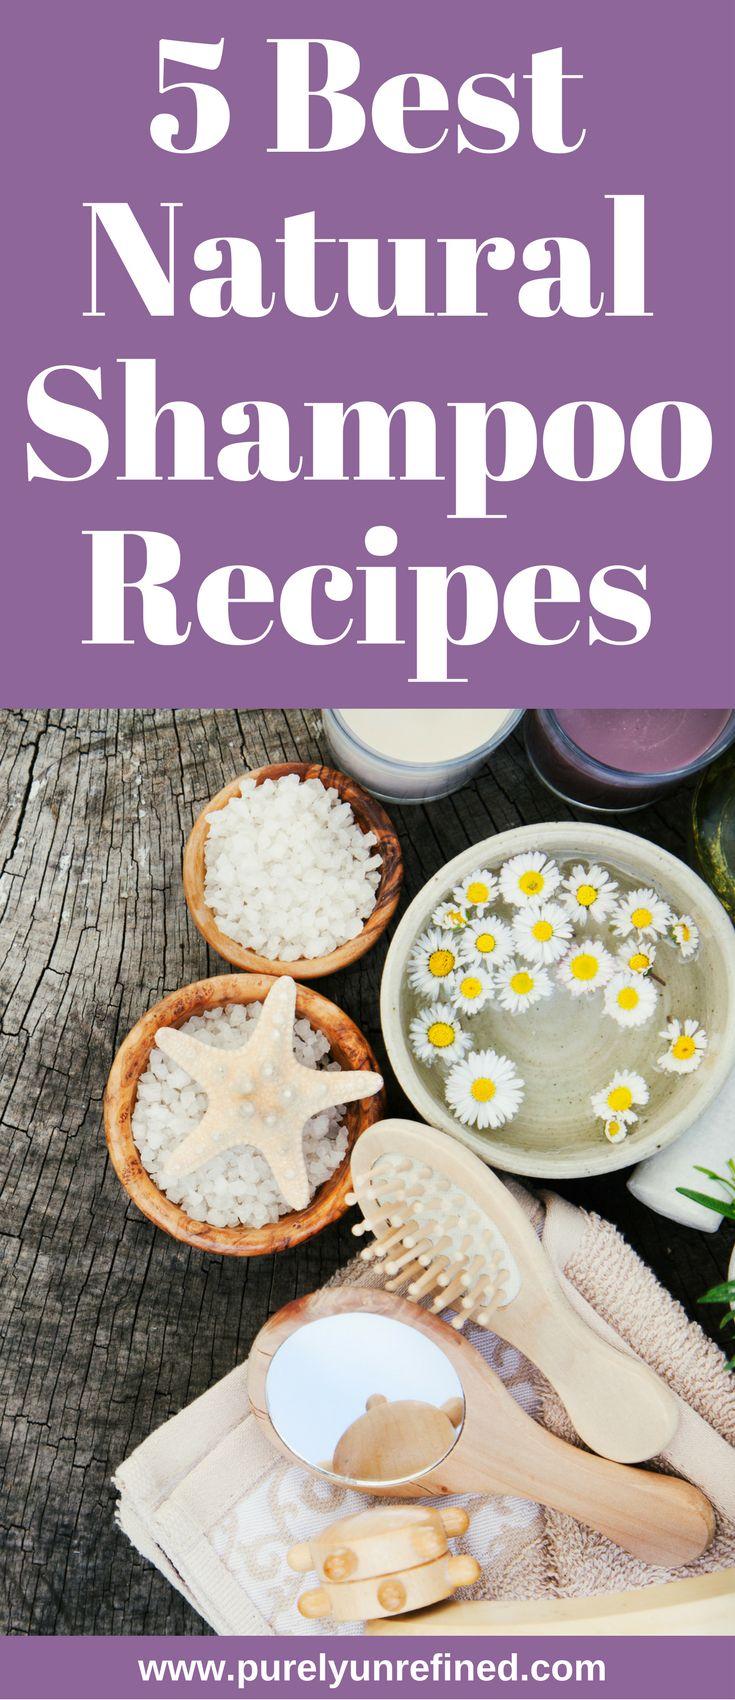 5 Best Natural Shampoo Recipes | Healthy | Natural Beauty